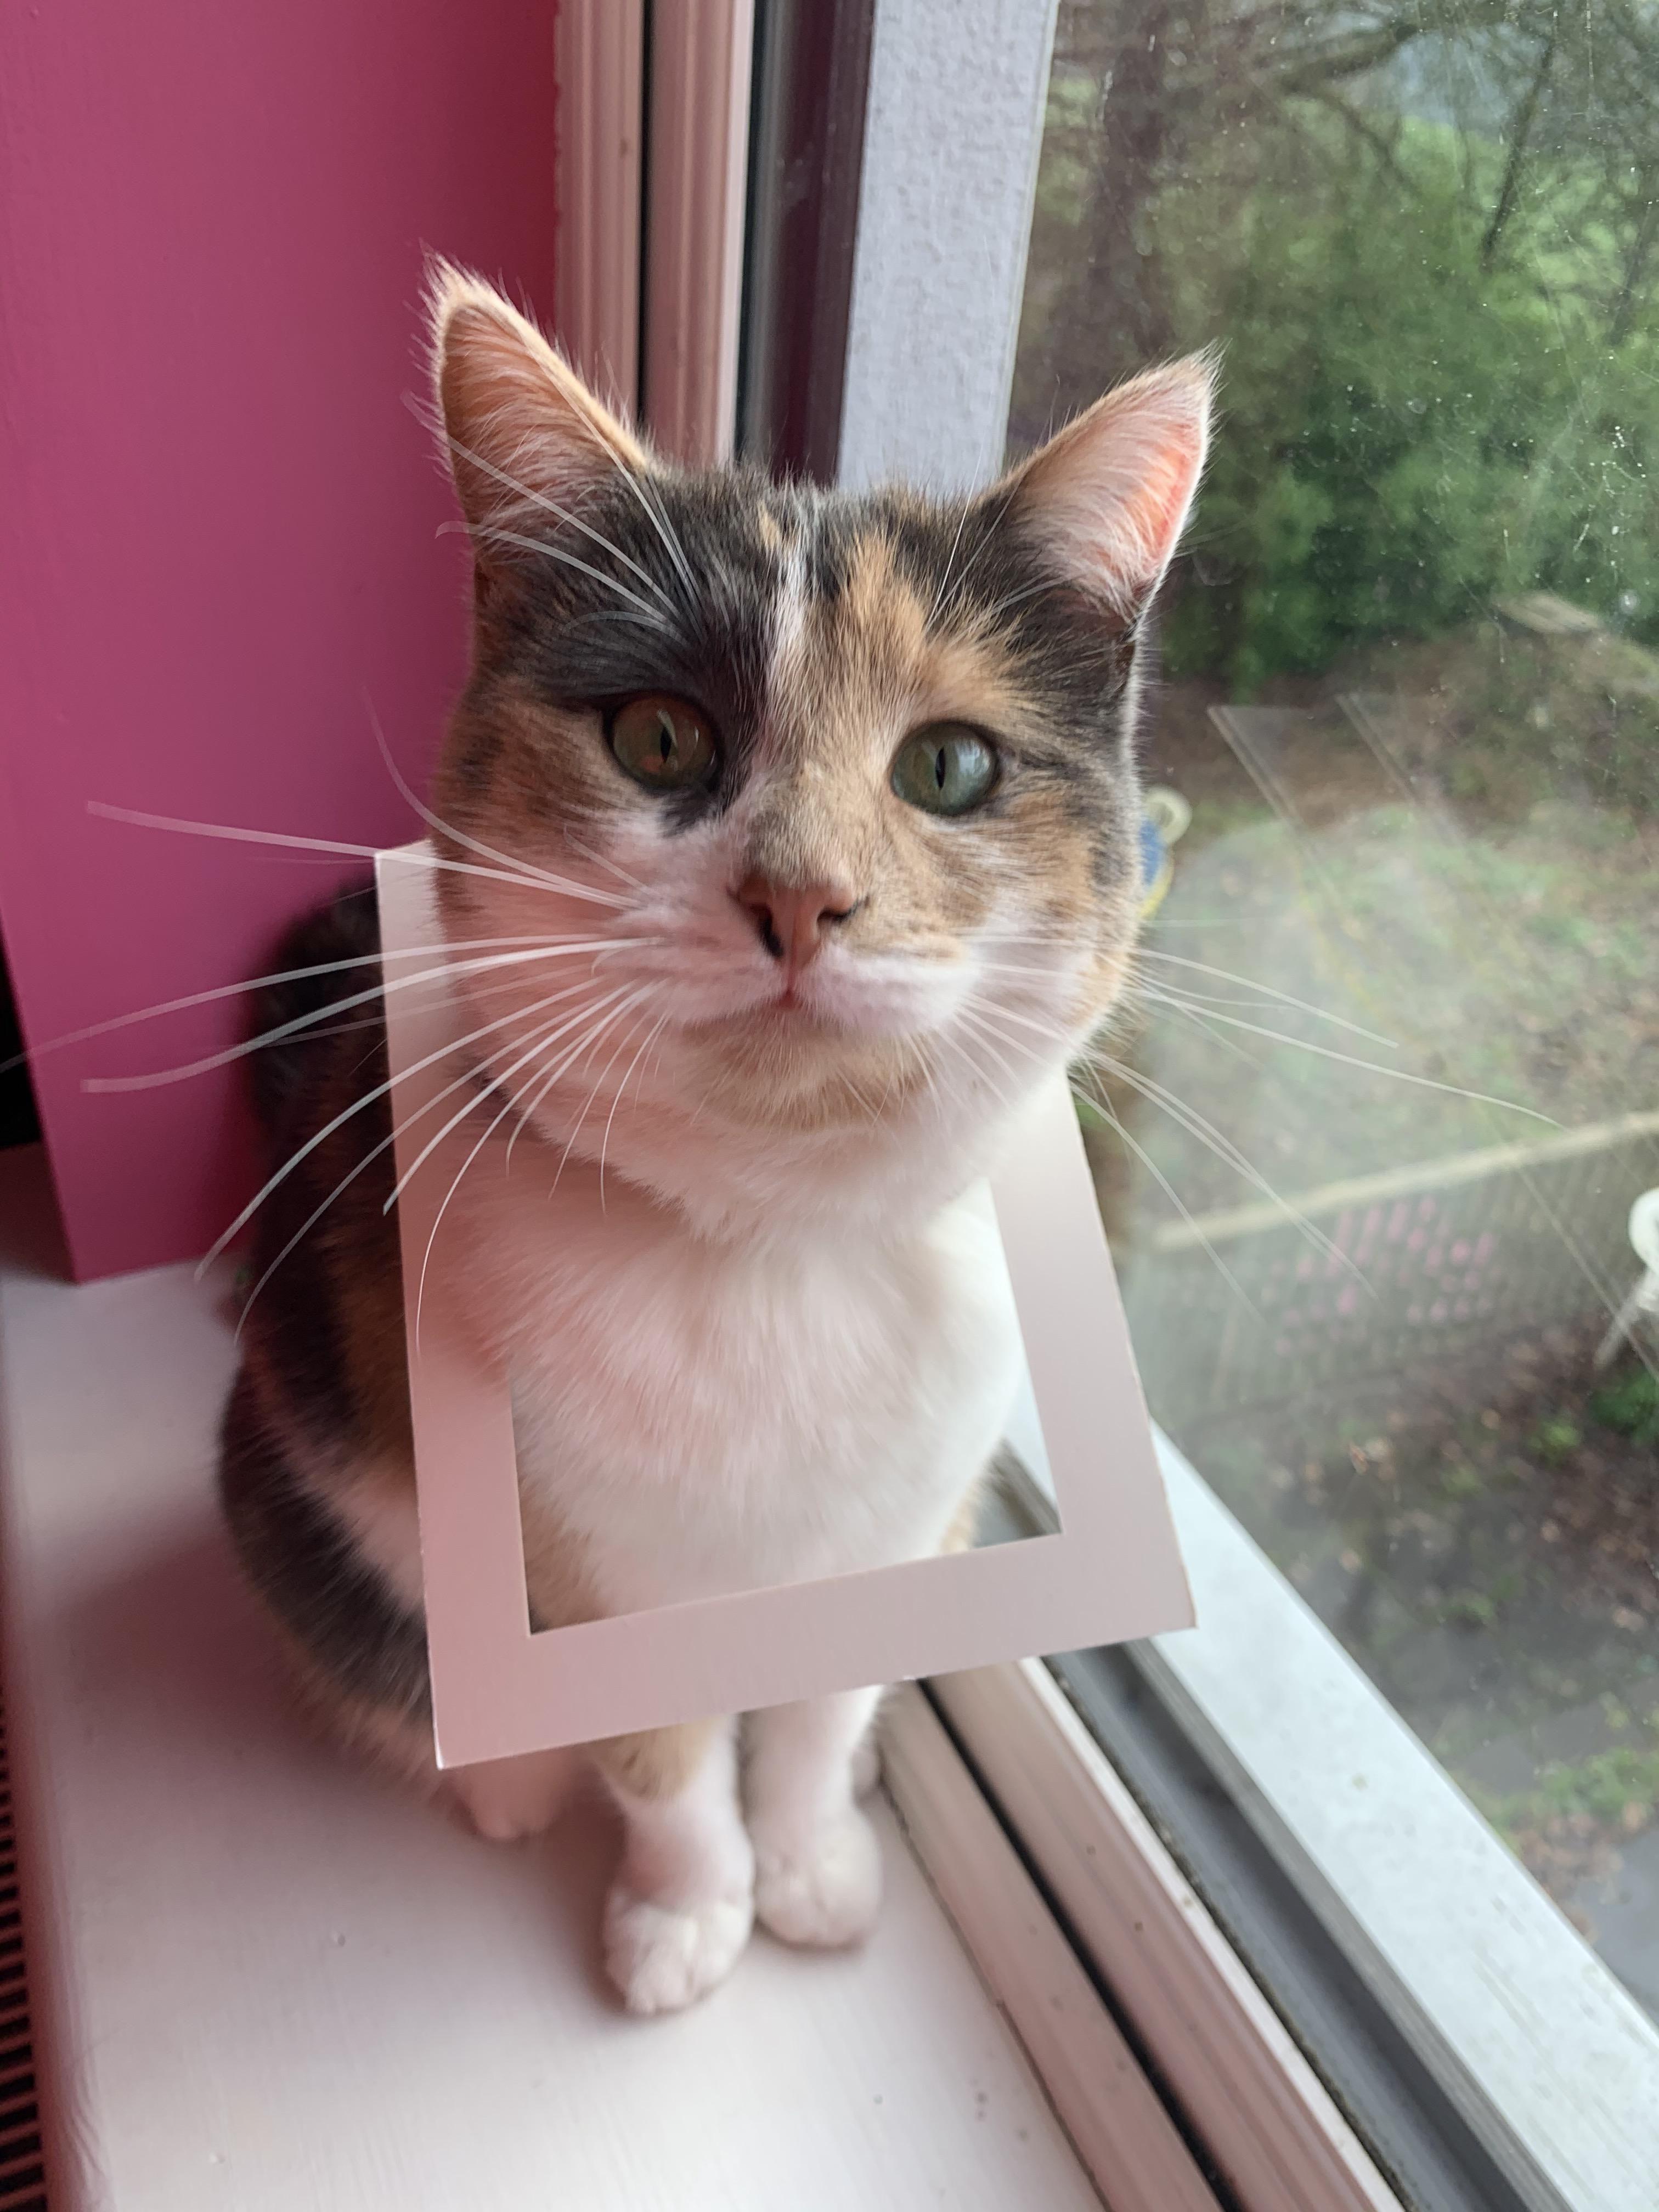 Picture puurfect https//ift.tt/2ukX8qI in 2020 Cat